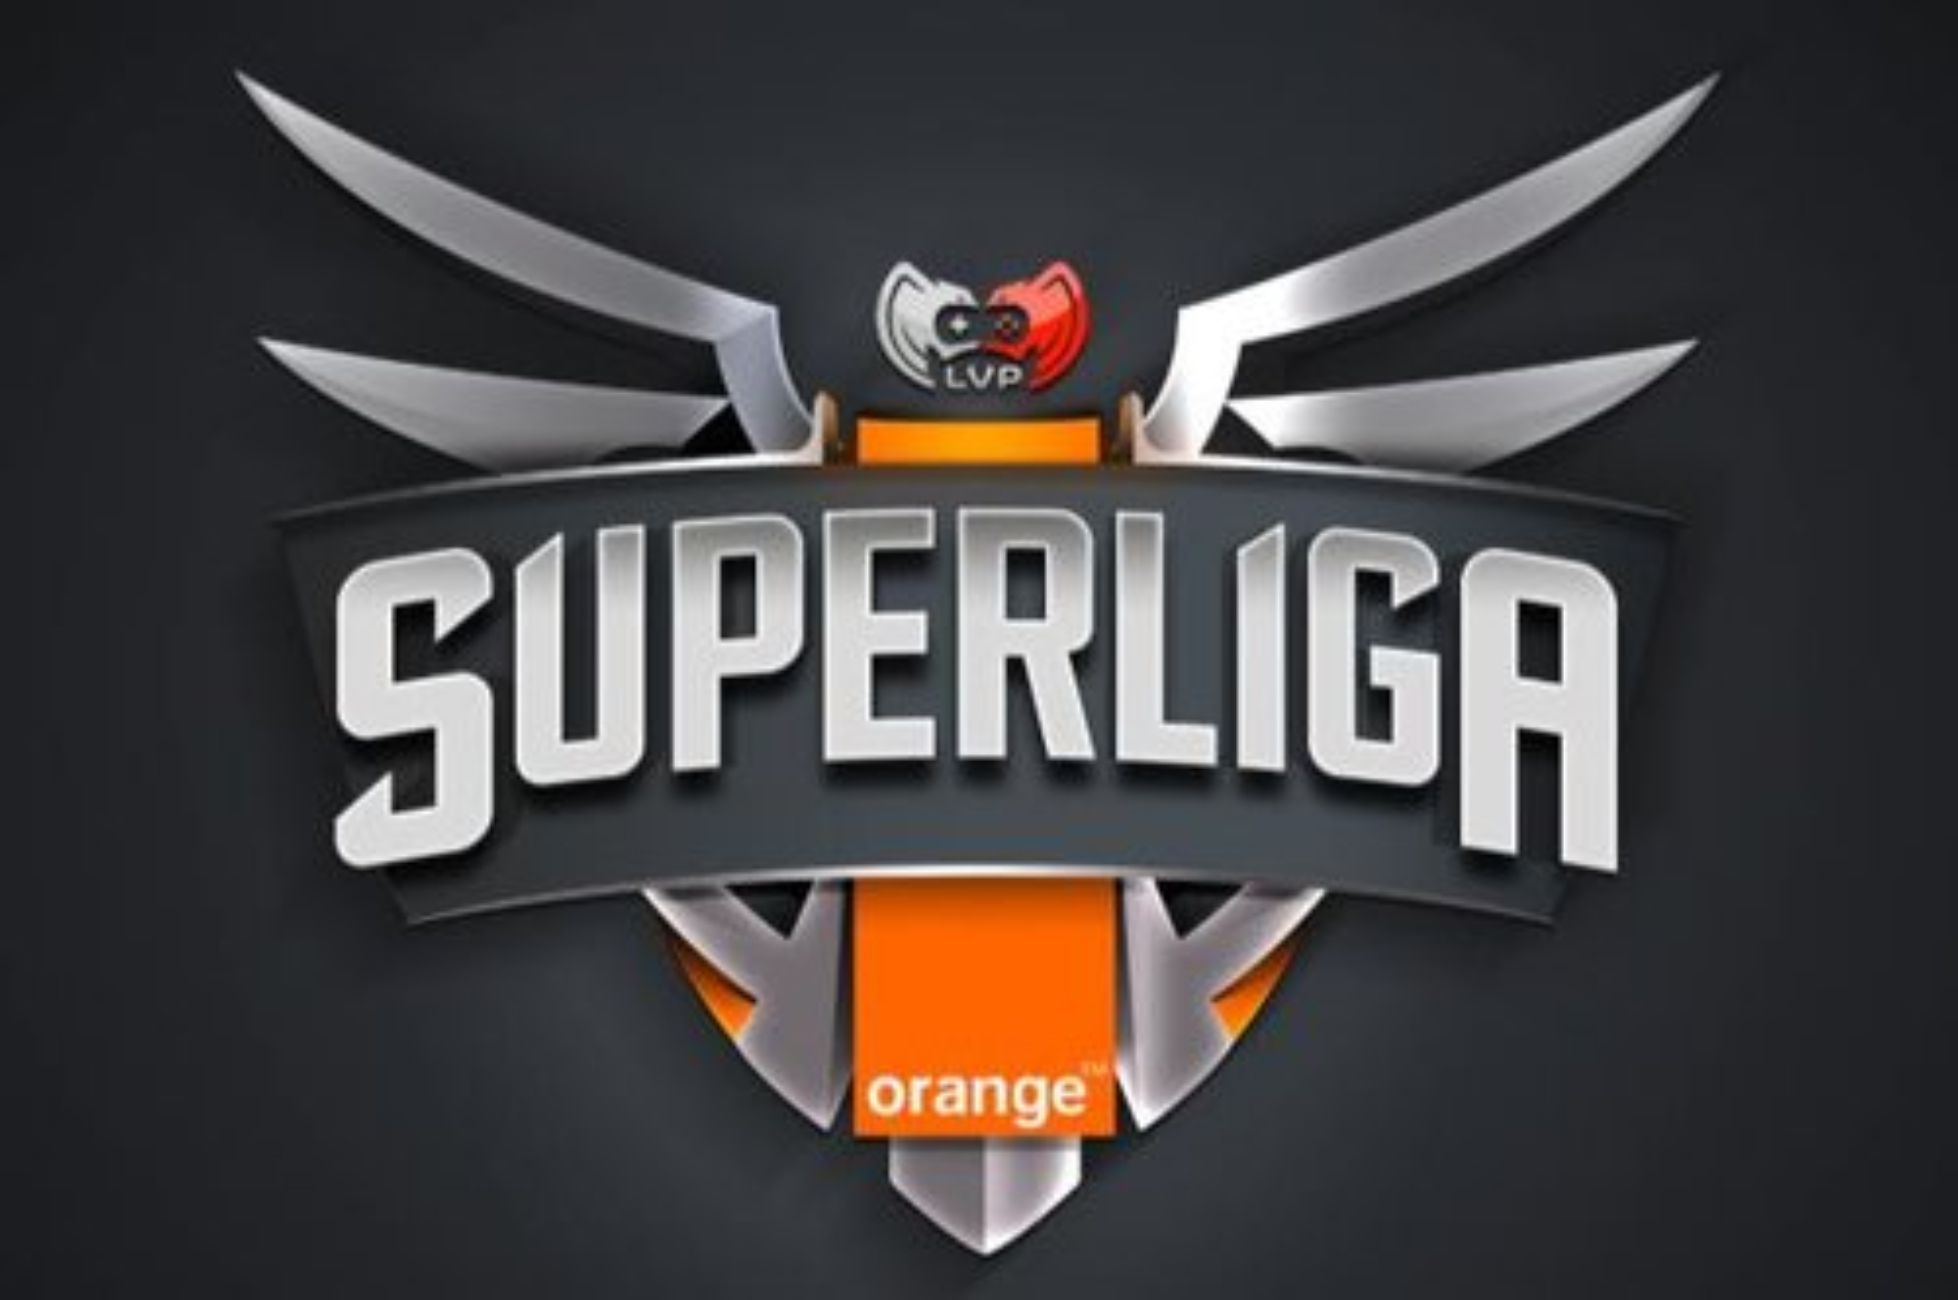 Superliga Orange.jpg